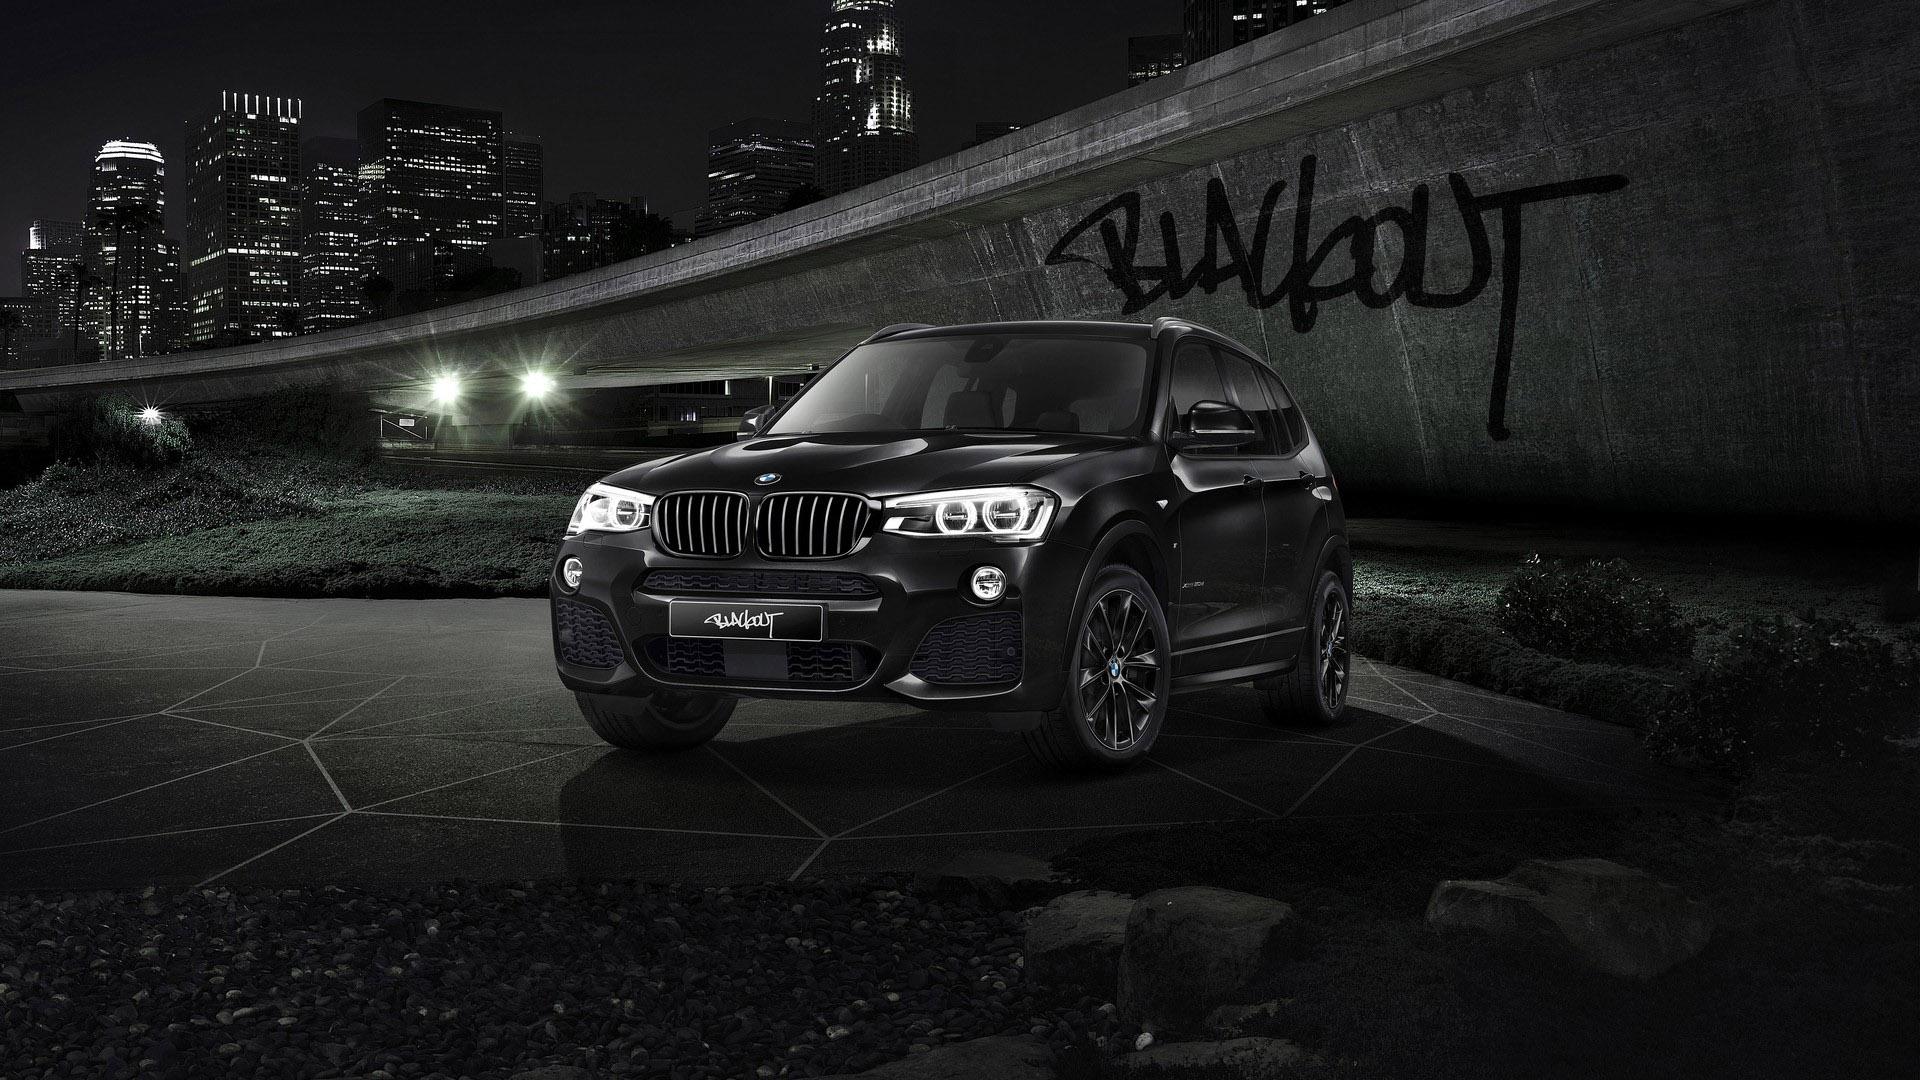 2016 BMW X3 Blackout Edition Wallpaper | HD Car Wallpapers ...